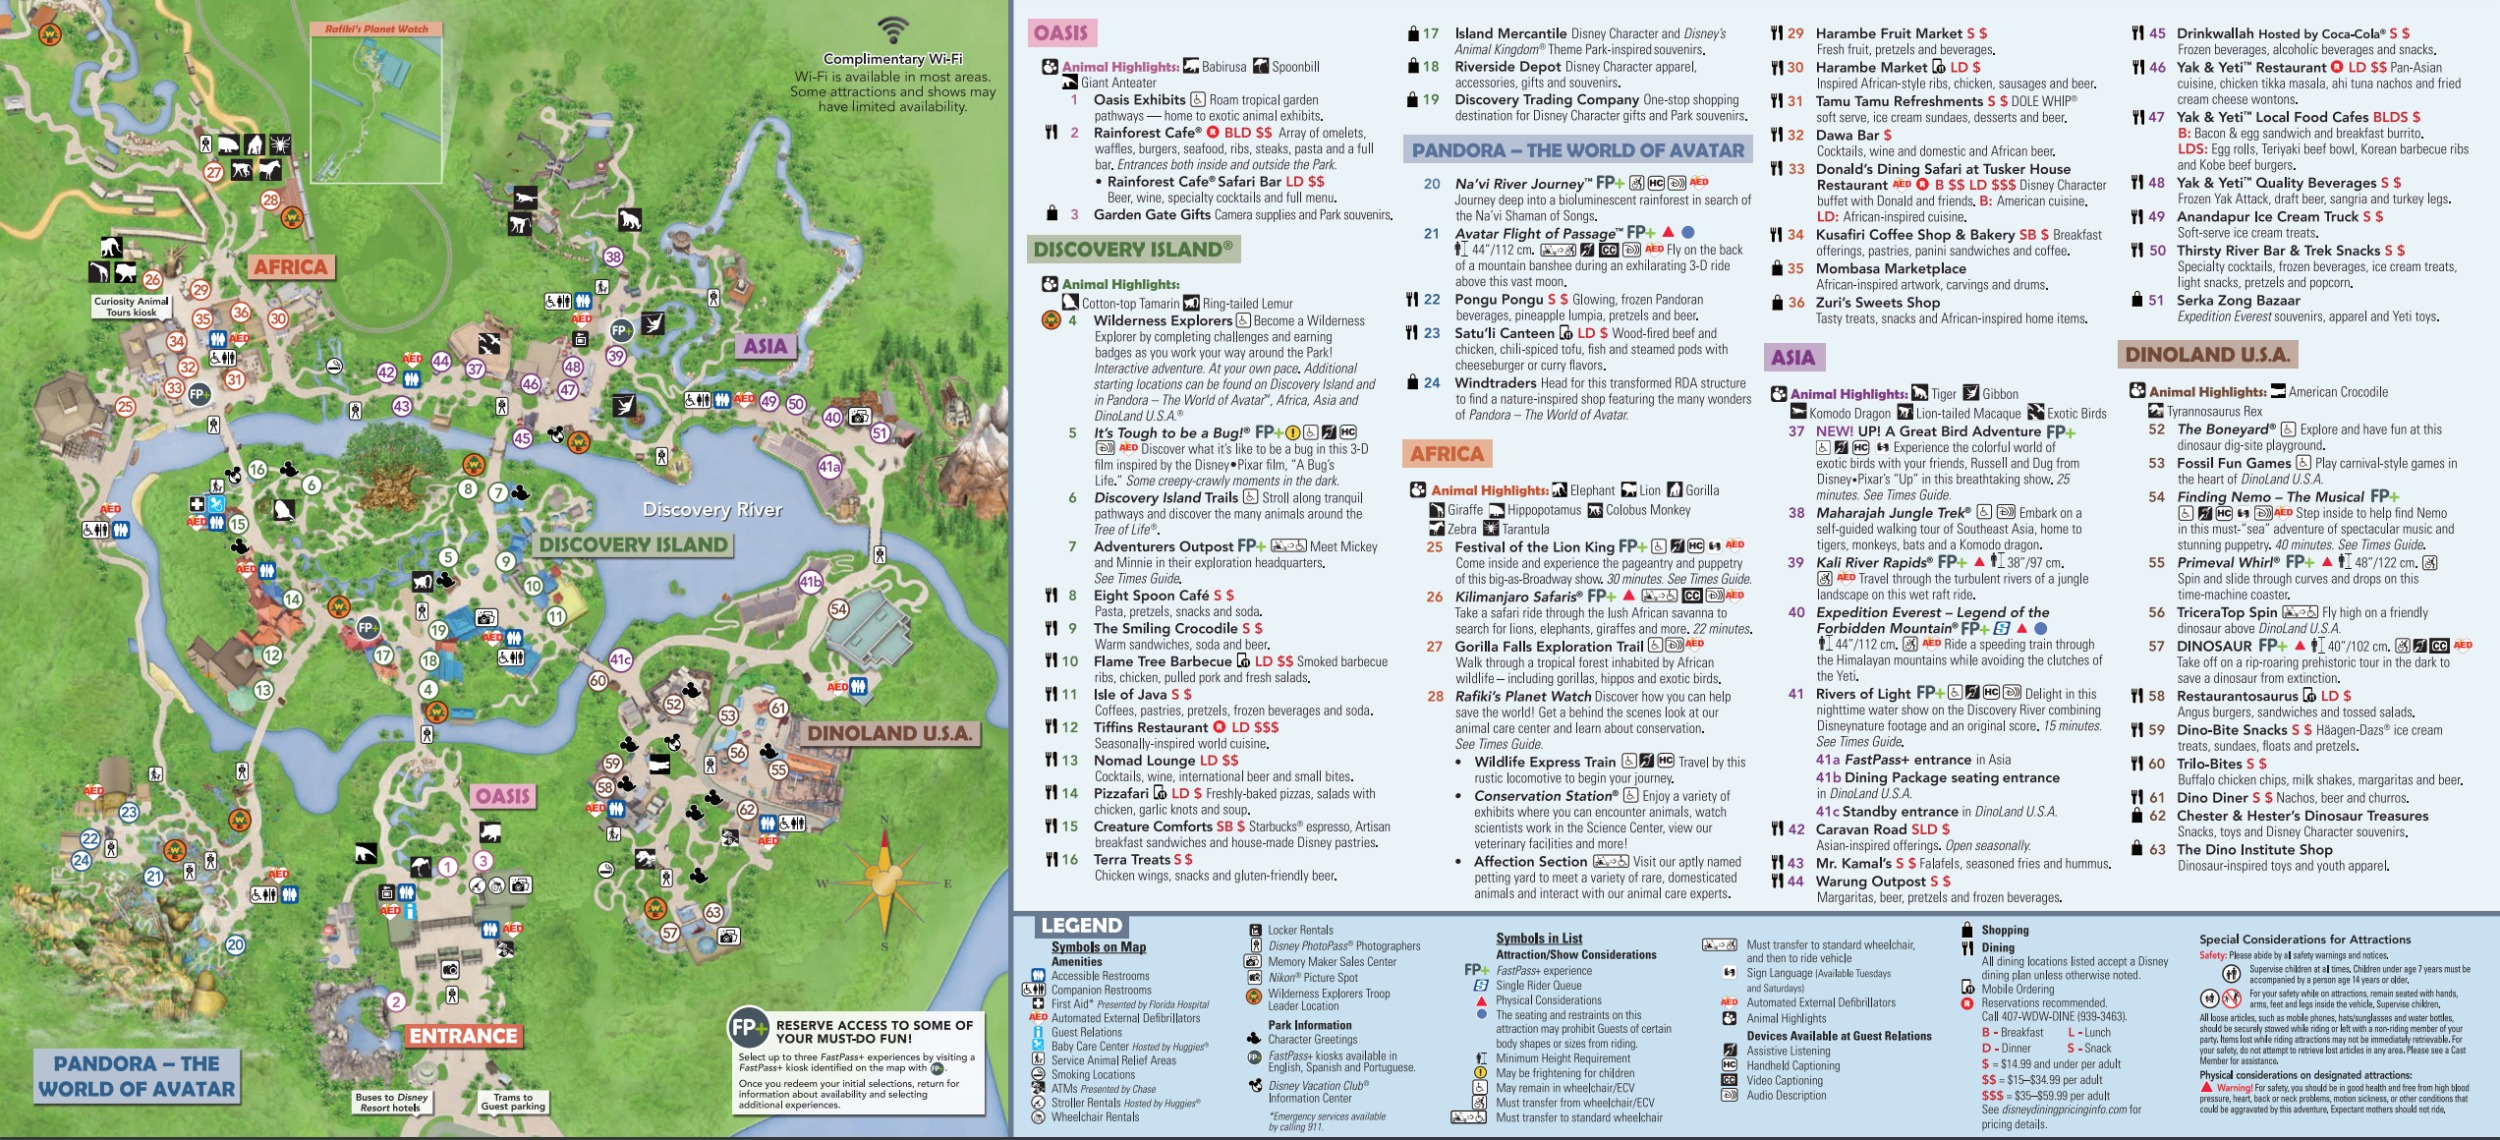 disney-animal-kingdom-map.jpg